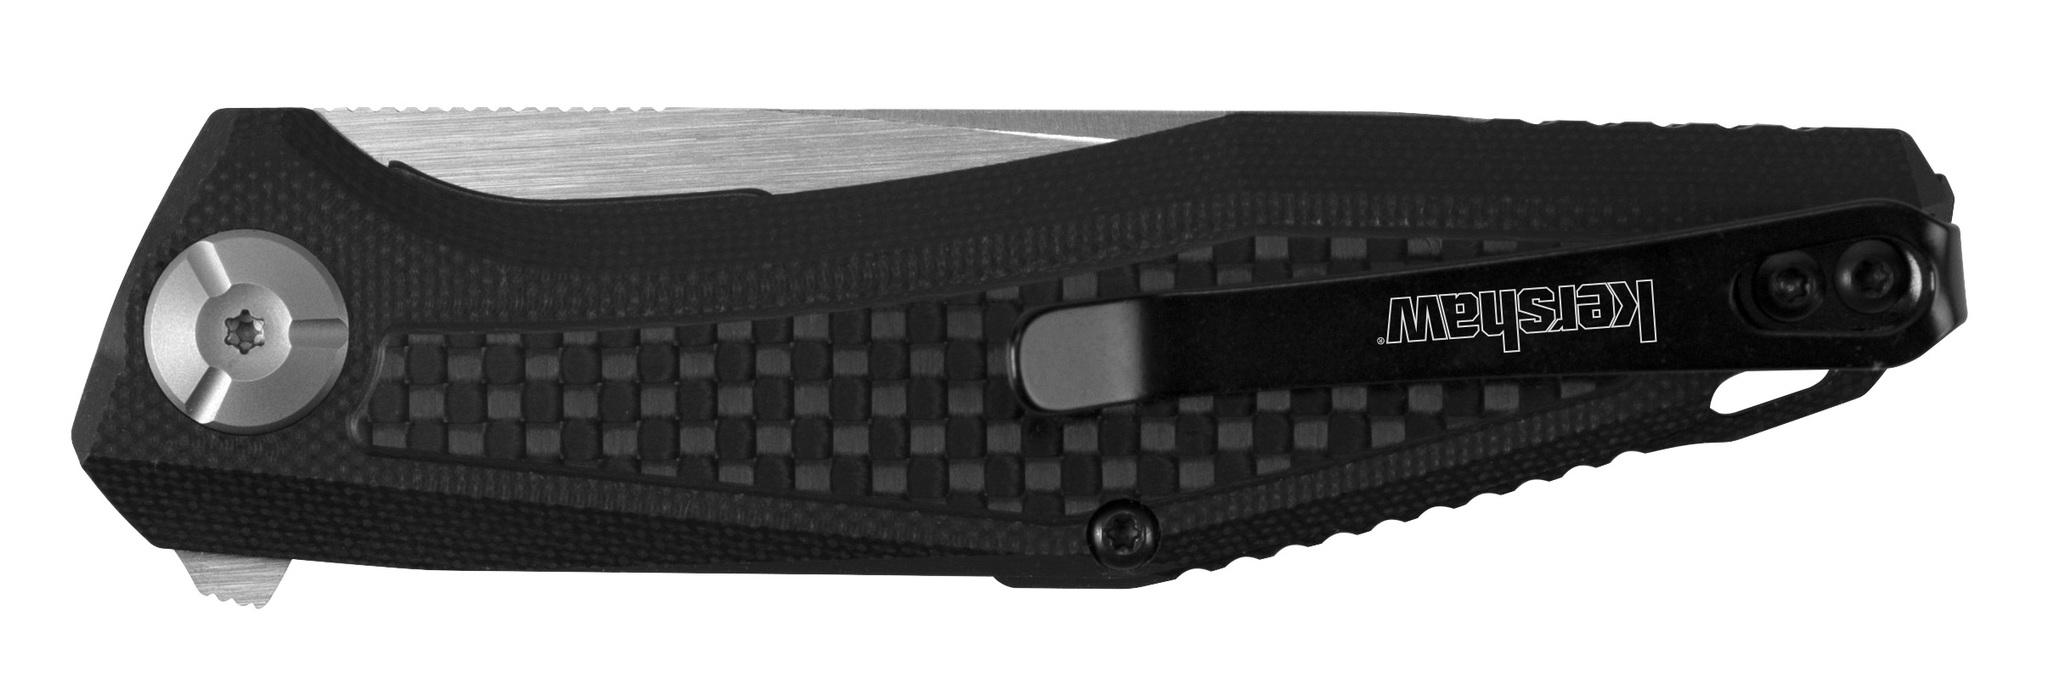 Фото 2 - Нож складной Atmos - Kershaw 4037, сталь 8Cr13MoV, рукоять G10/карбон